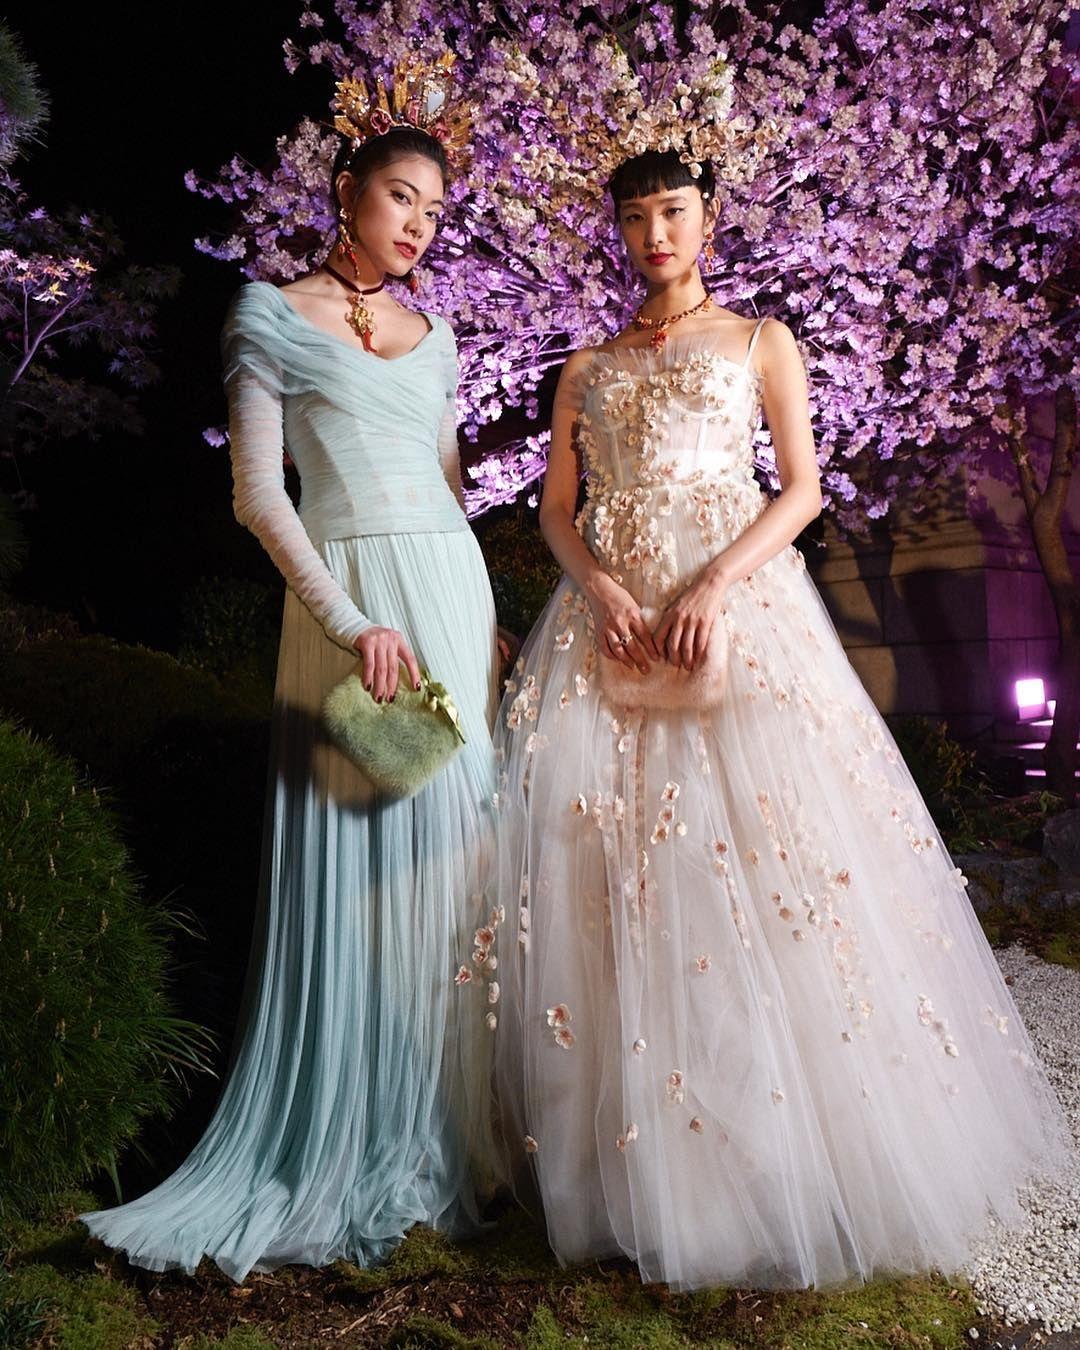 2129b974896e22 Dolce&Gabbana Alta Moda and Alta Sartoria, Tokyo National Museum, Tokyo  April 13th, 2017 #DGLovesJapan #artigianatoitaliano #madeinitaly #DGラブジャパン  ...